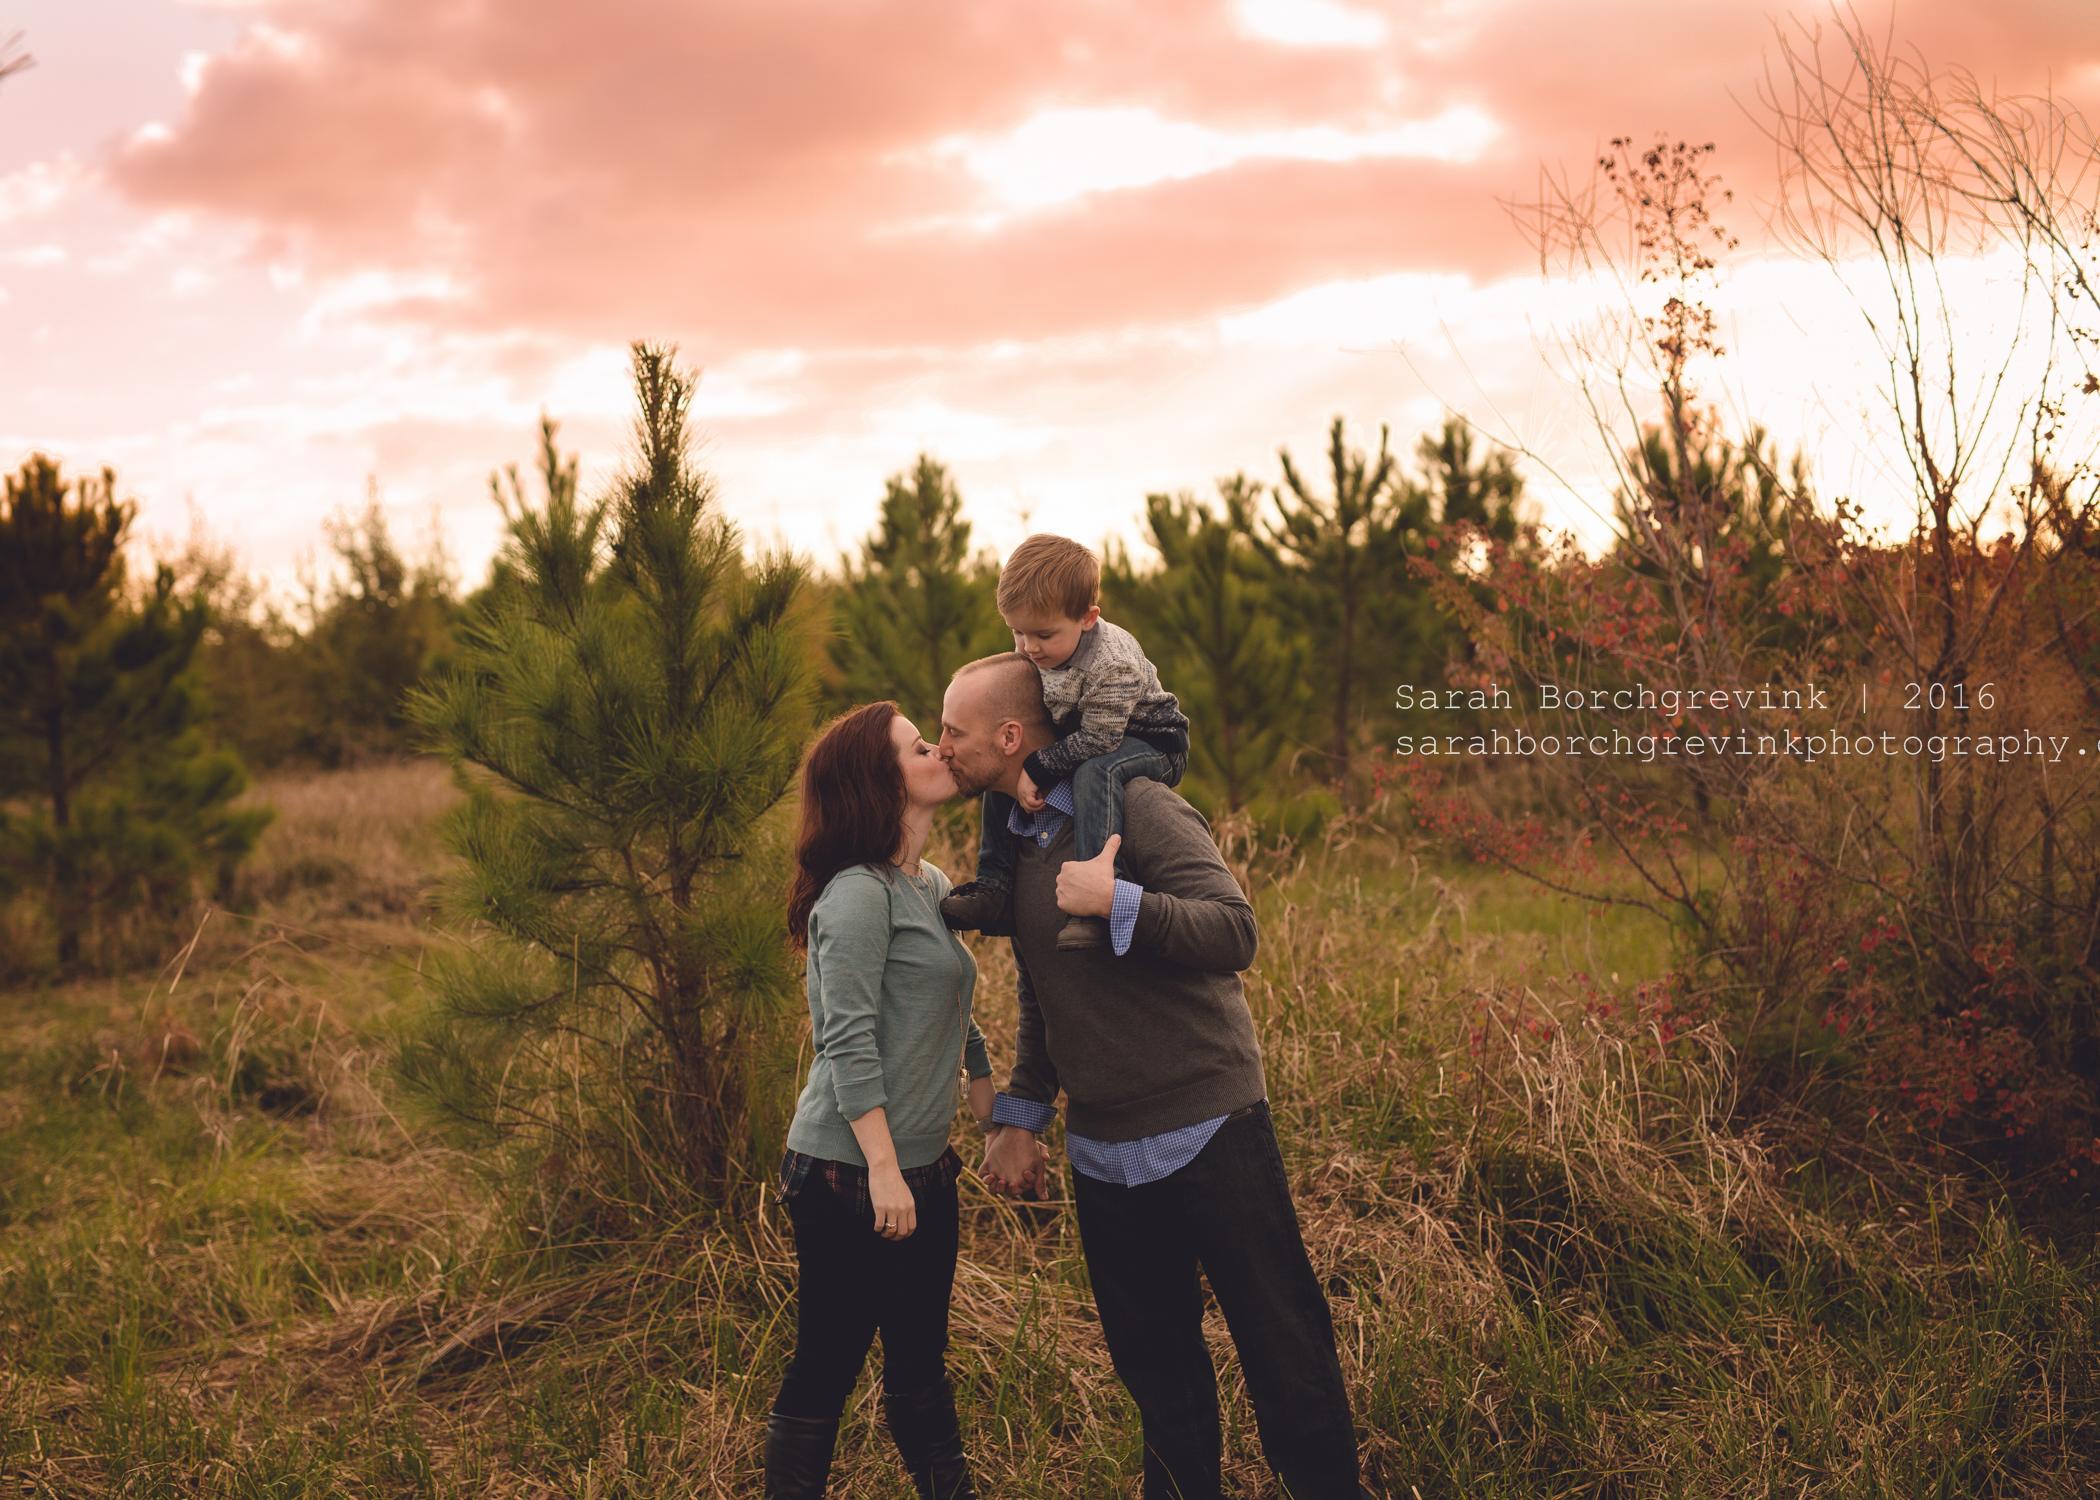 Sarah Borchgrevink Photography | Houston TX Photography